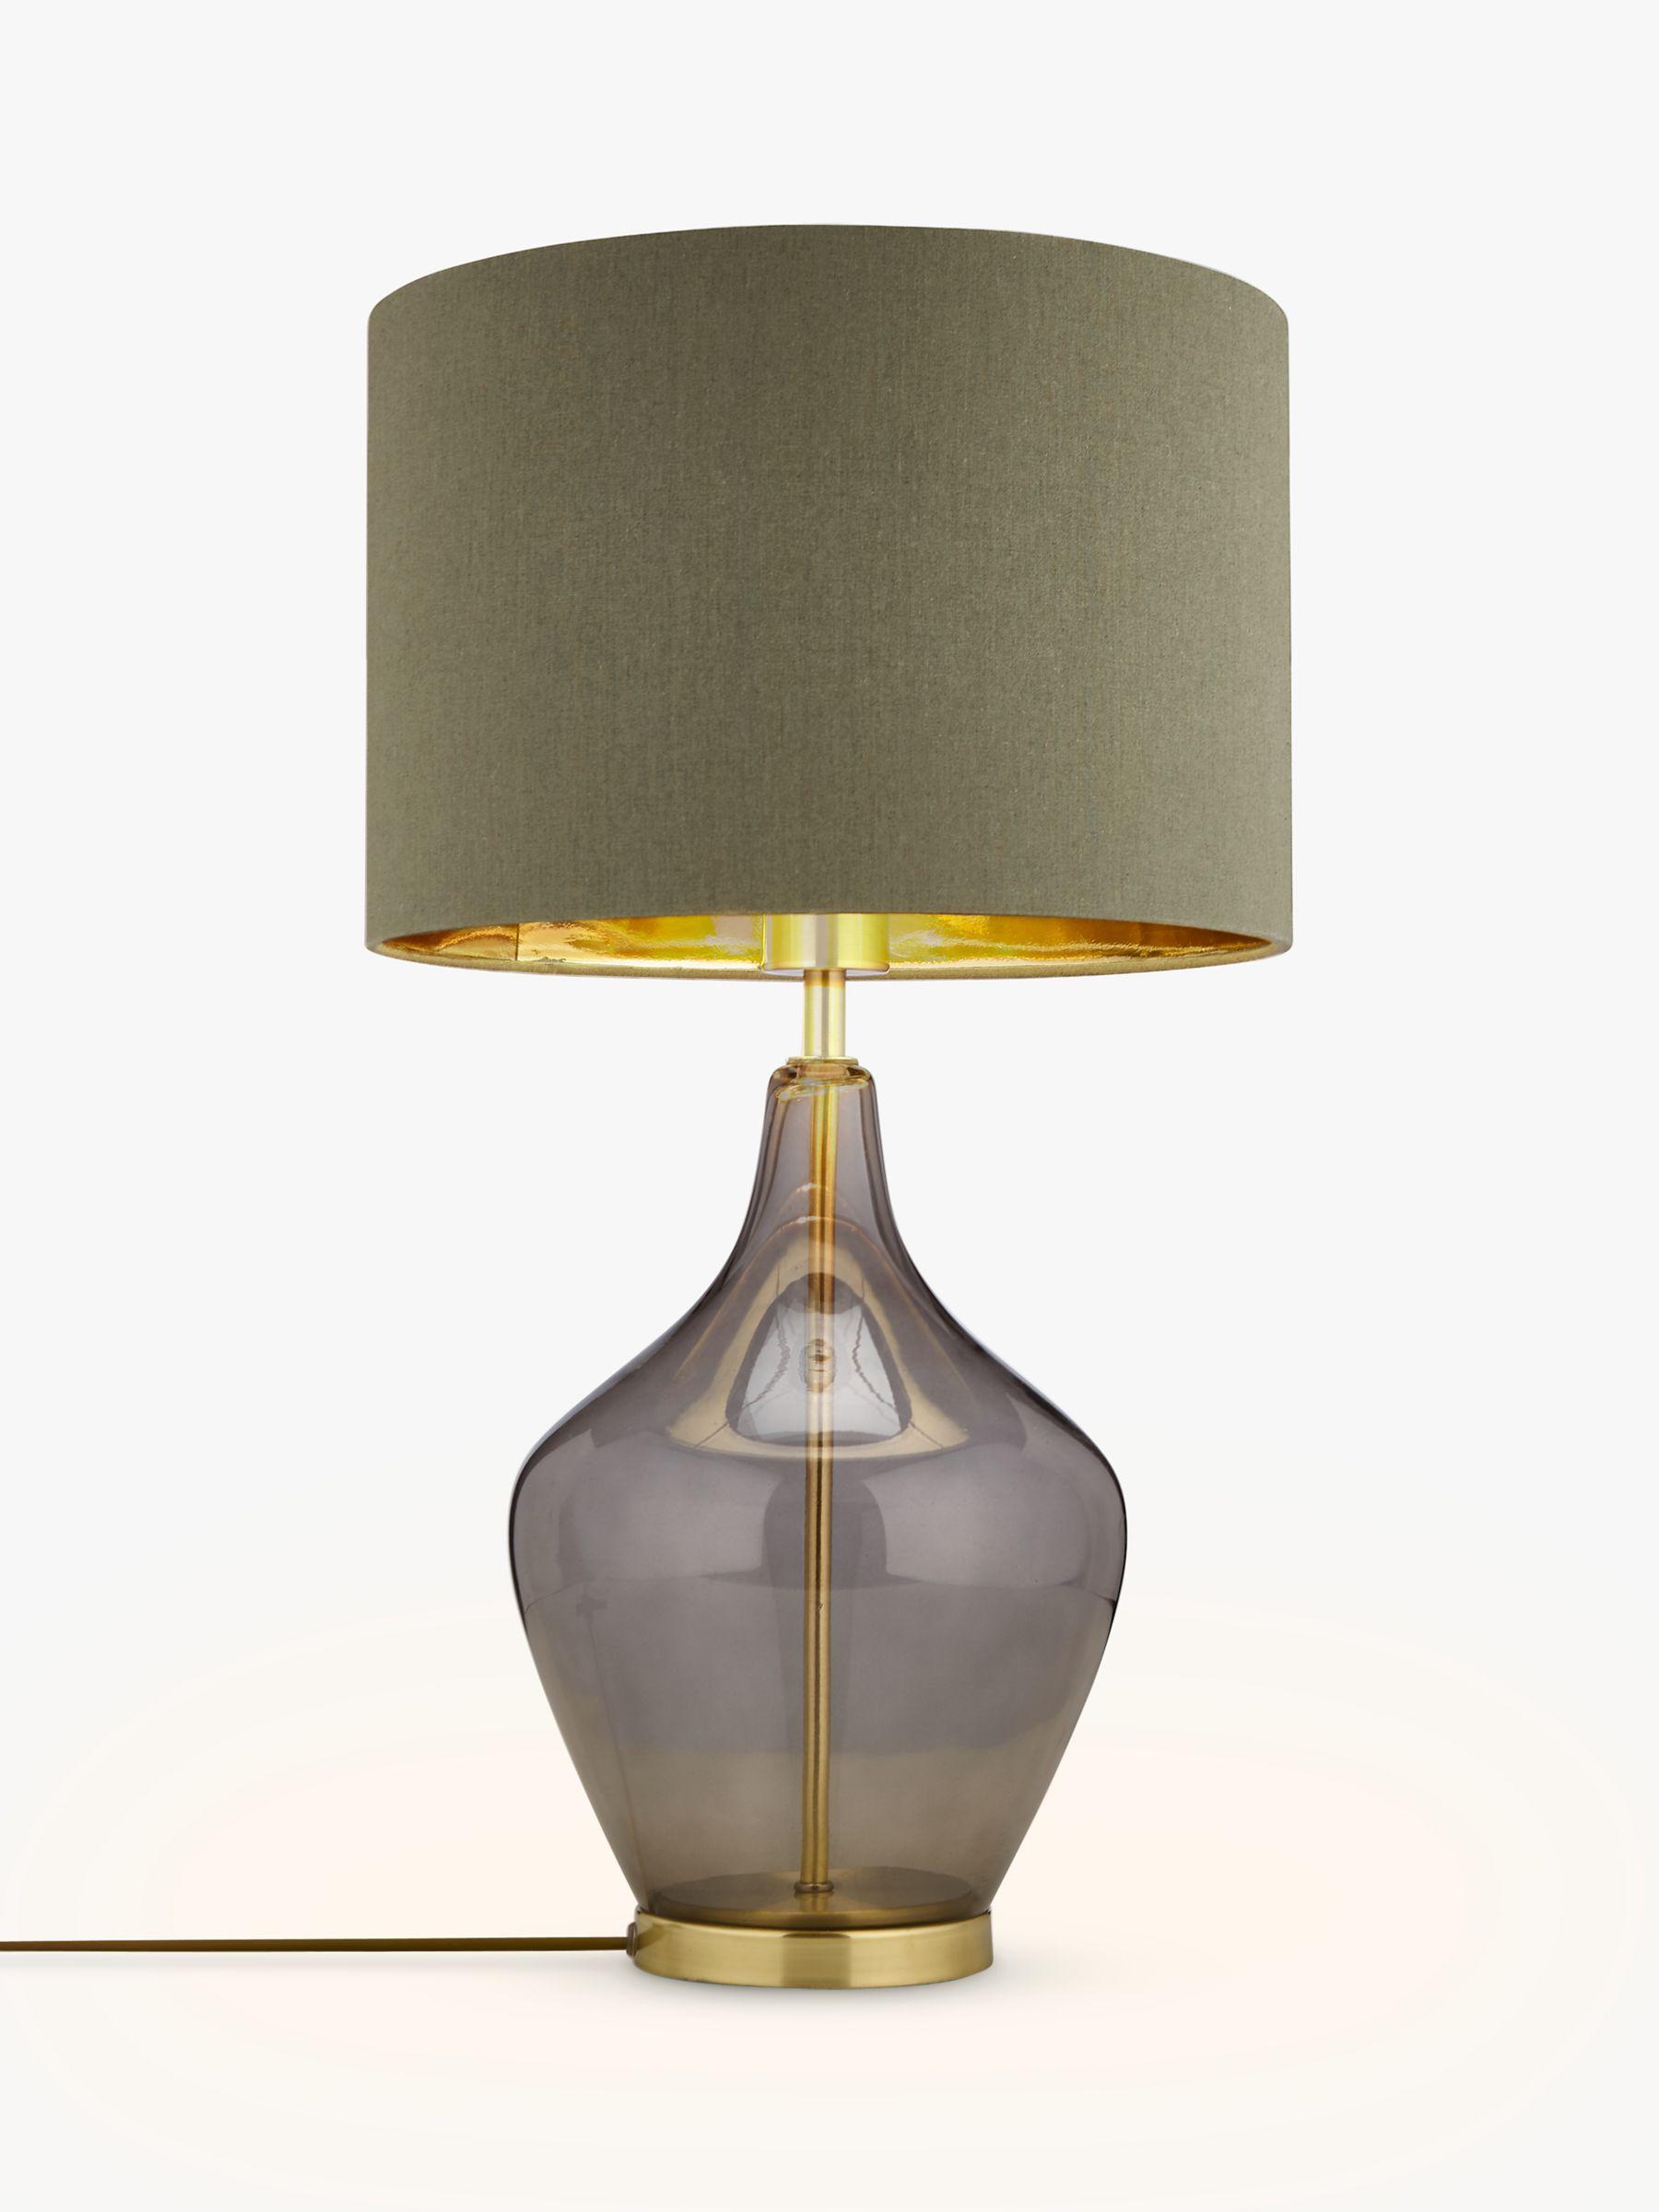 Glass Table Lamp John Deere : John lewis ursula table lamp smoked glass bluewater £